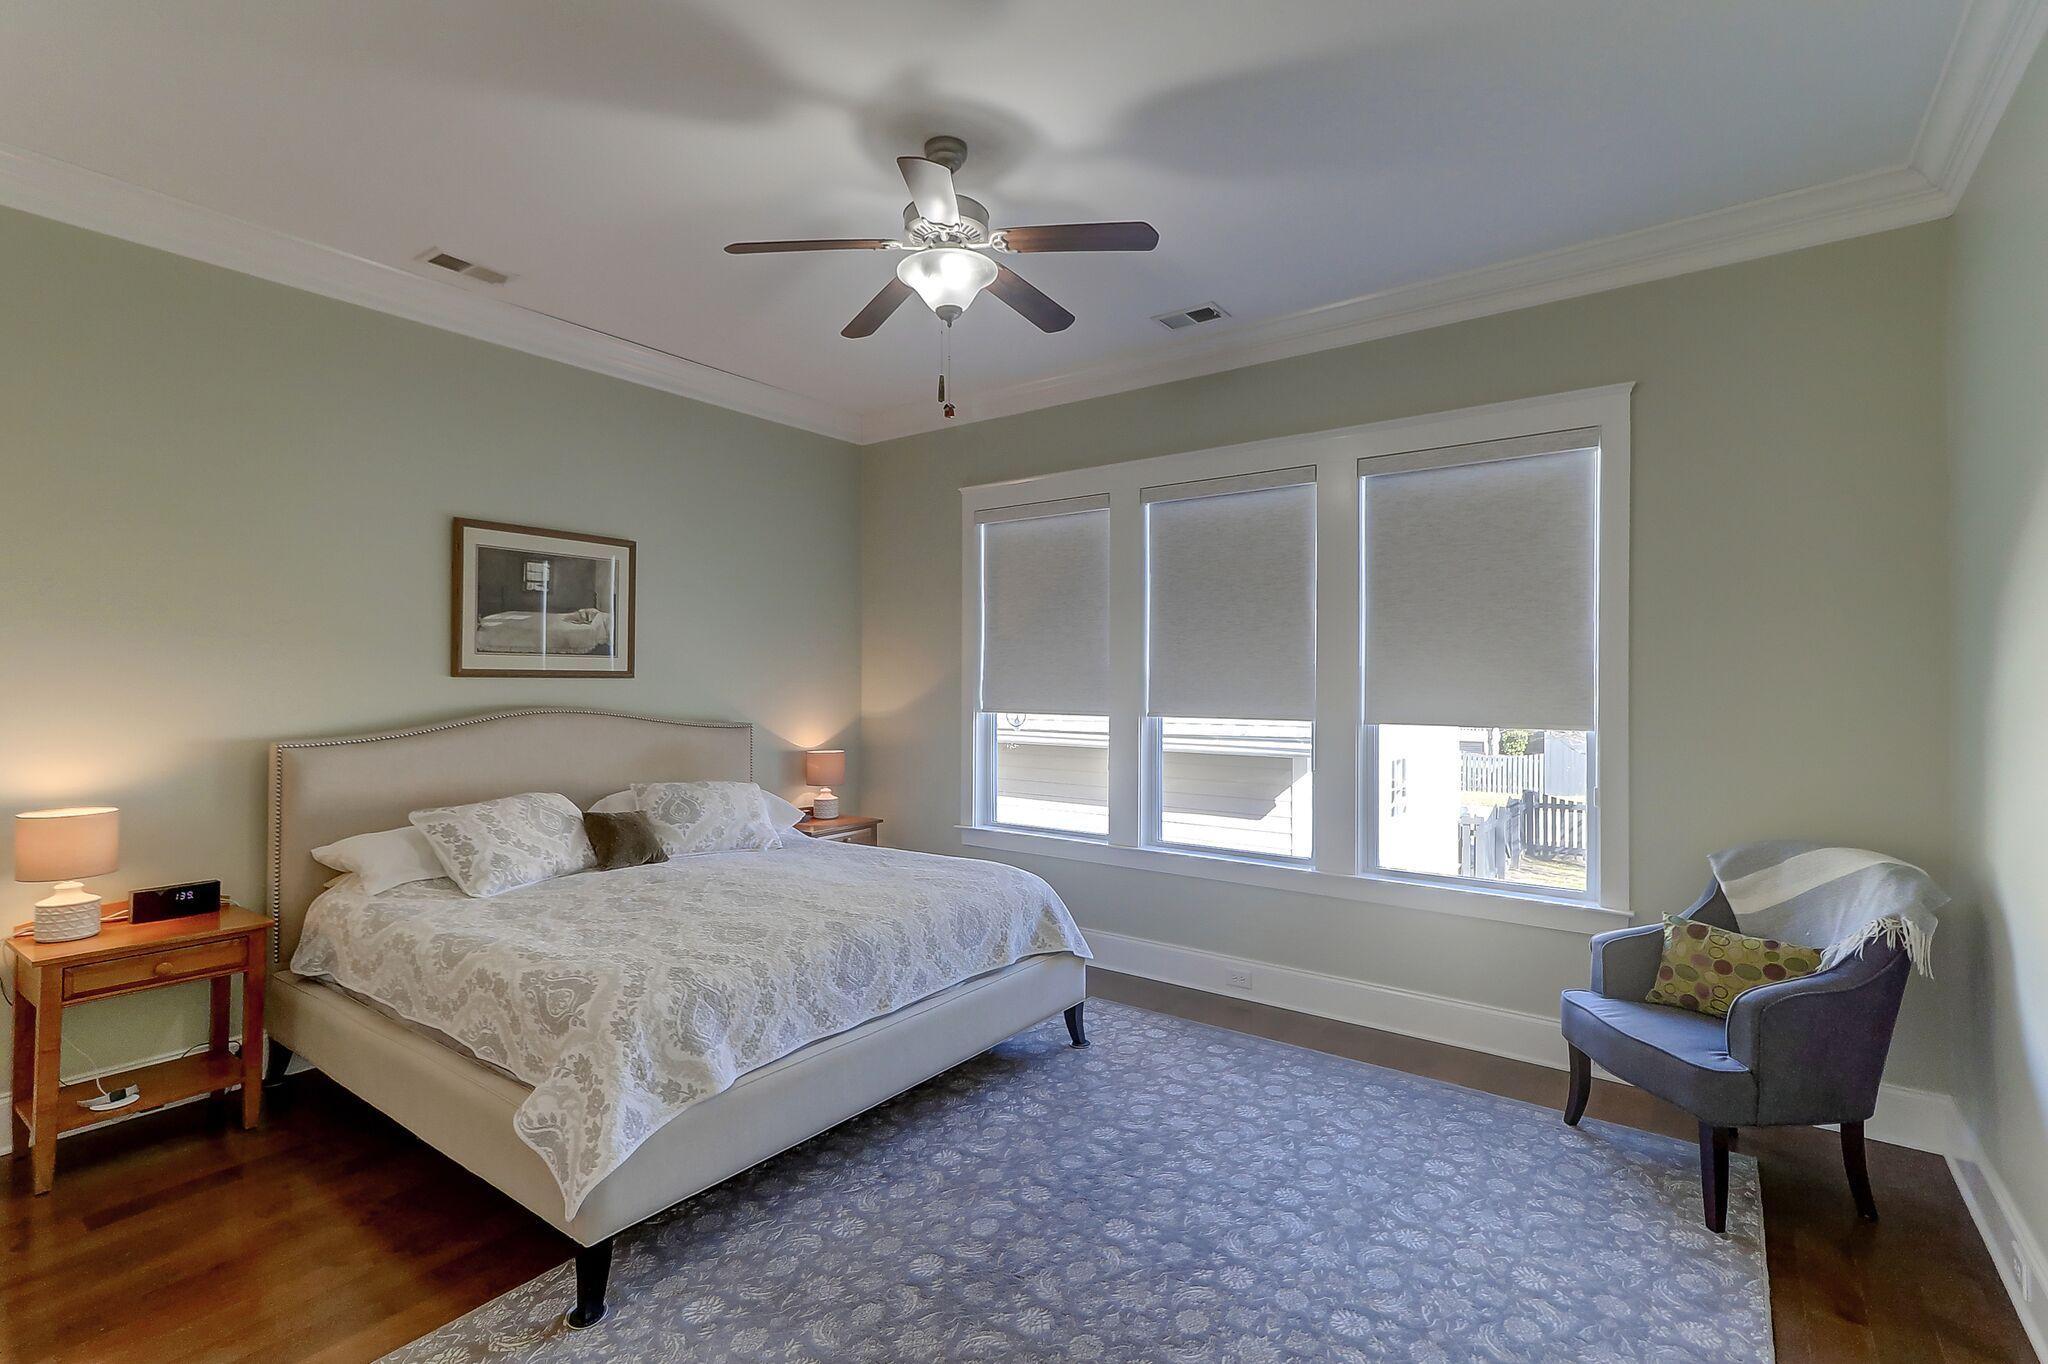 Daniel Island Smythe Park Homes For Sale - 1706 Sailmaker, Charleston, SC - 17